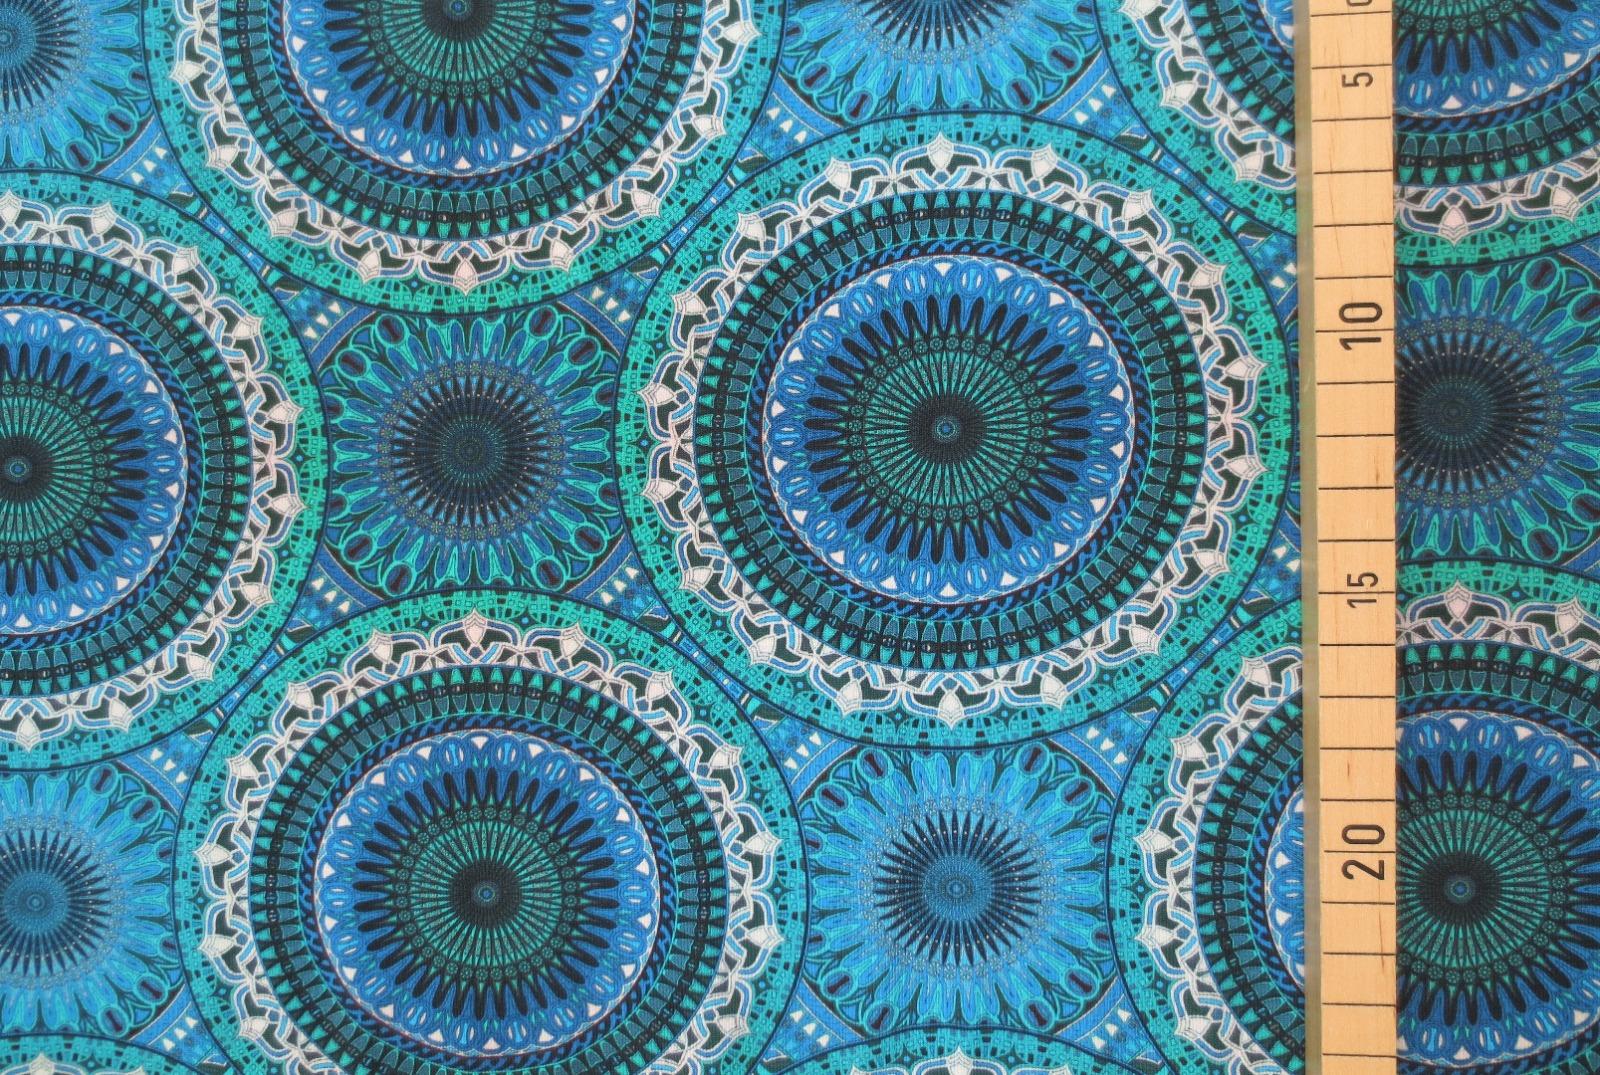 Jersey Mandala - Blautöne- Ornamente